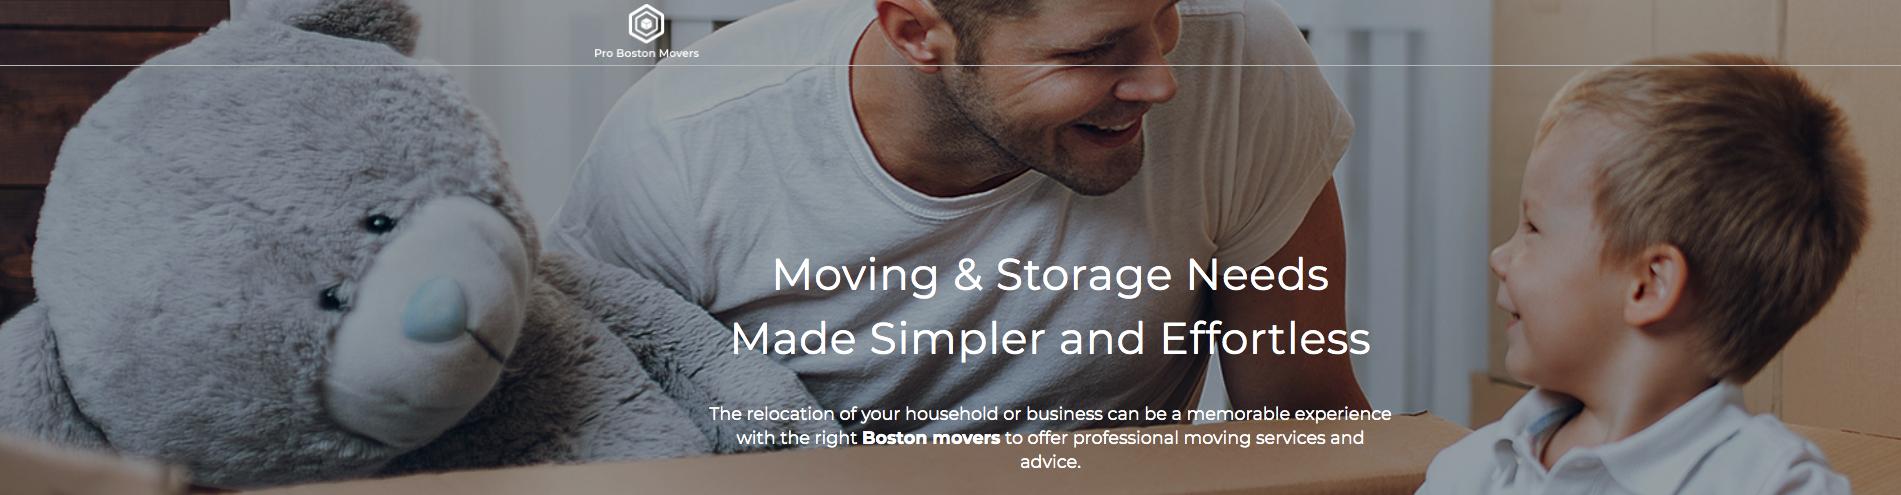 Pro Boston Movers